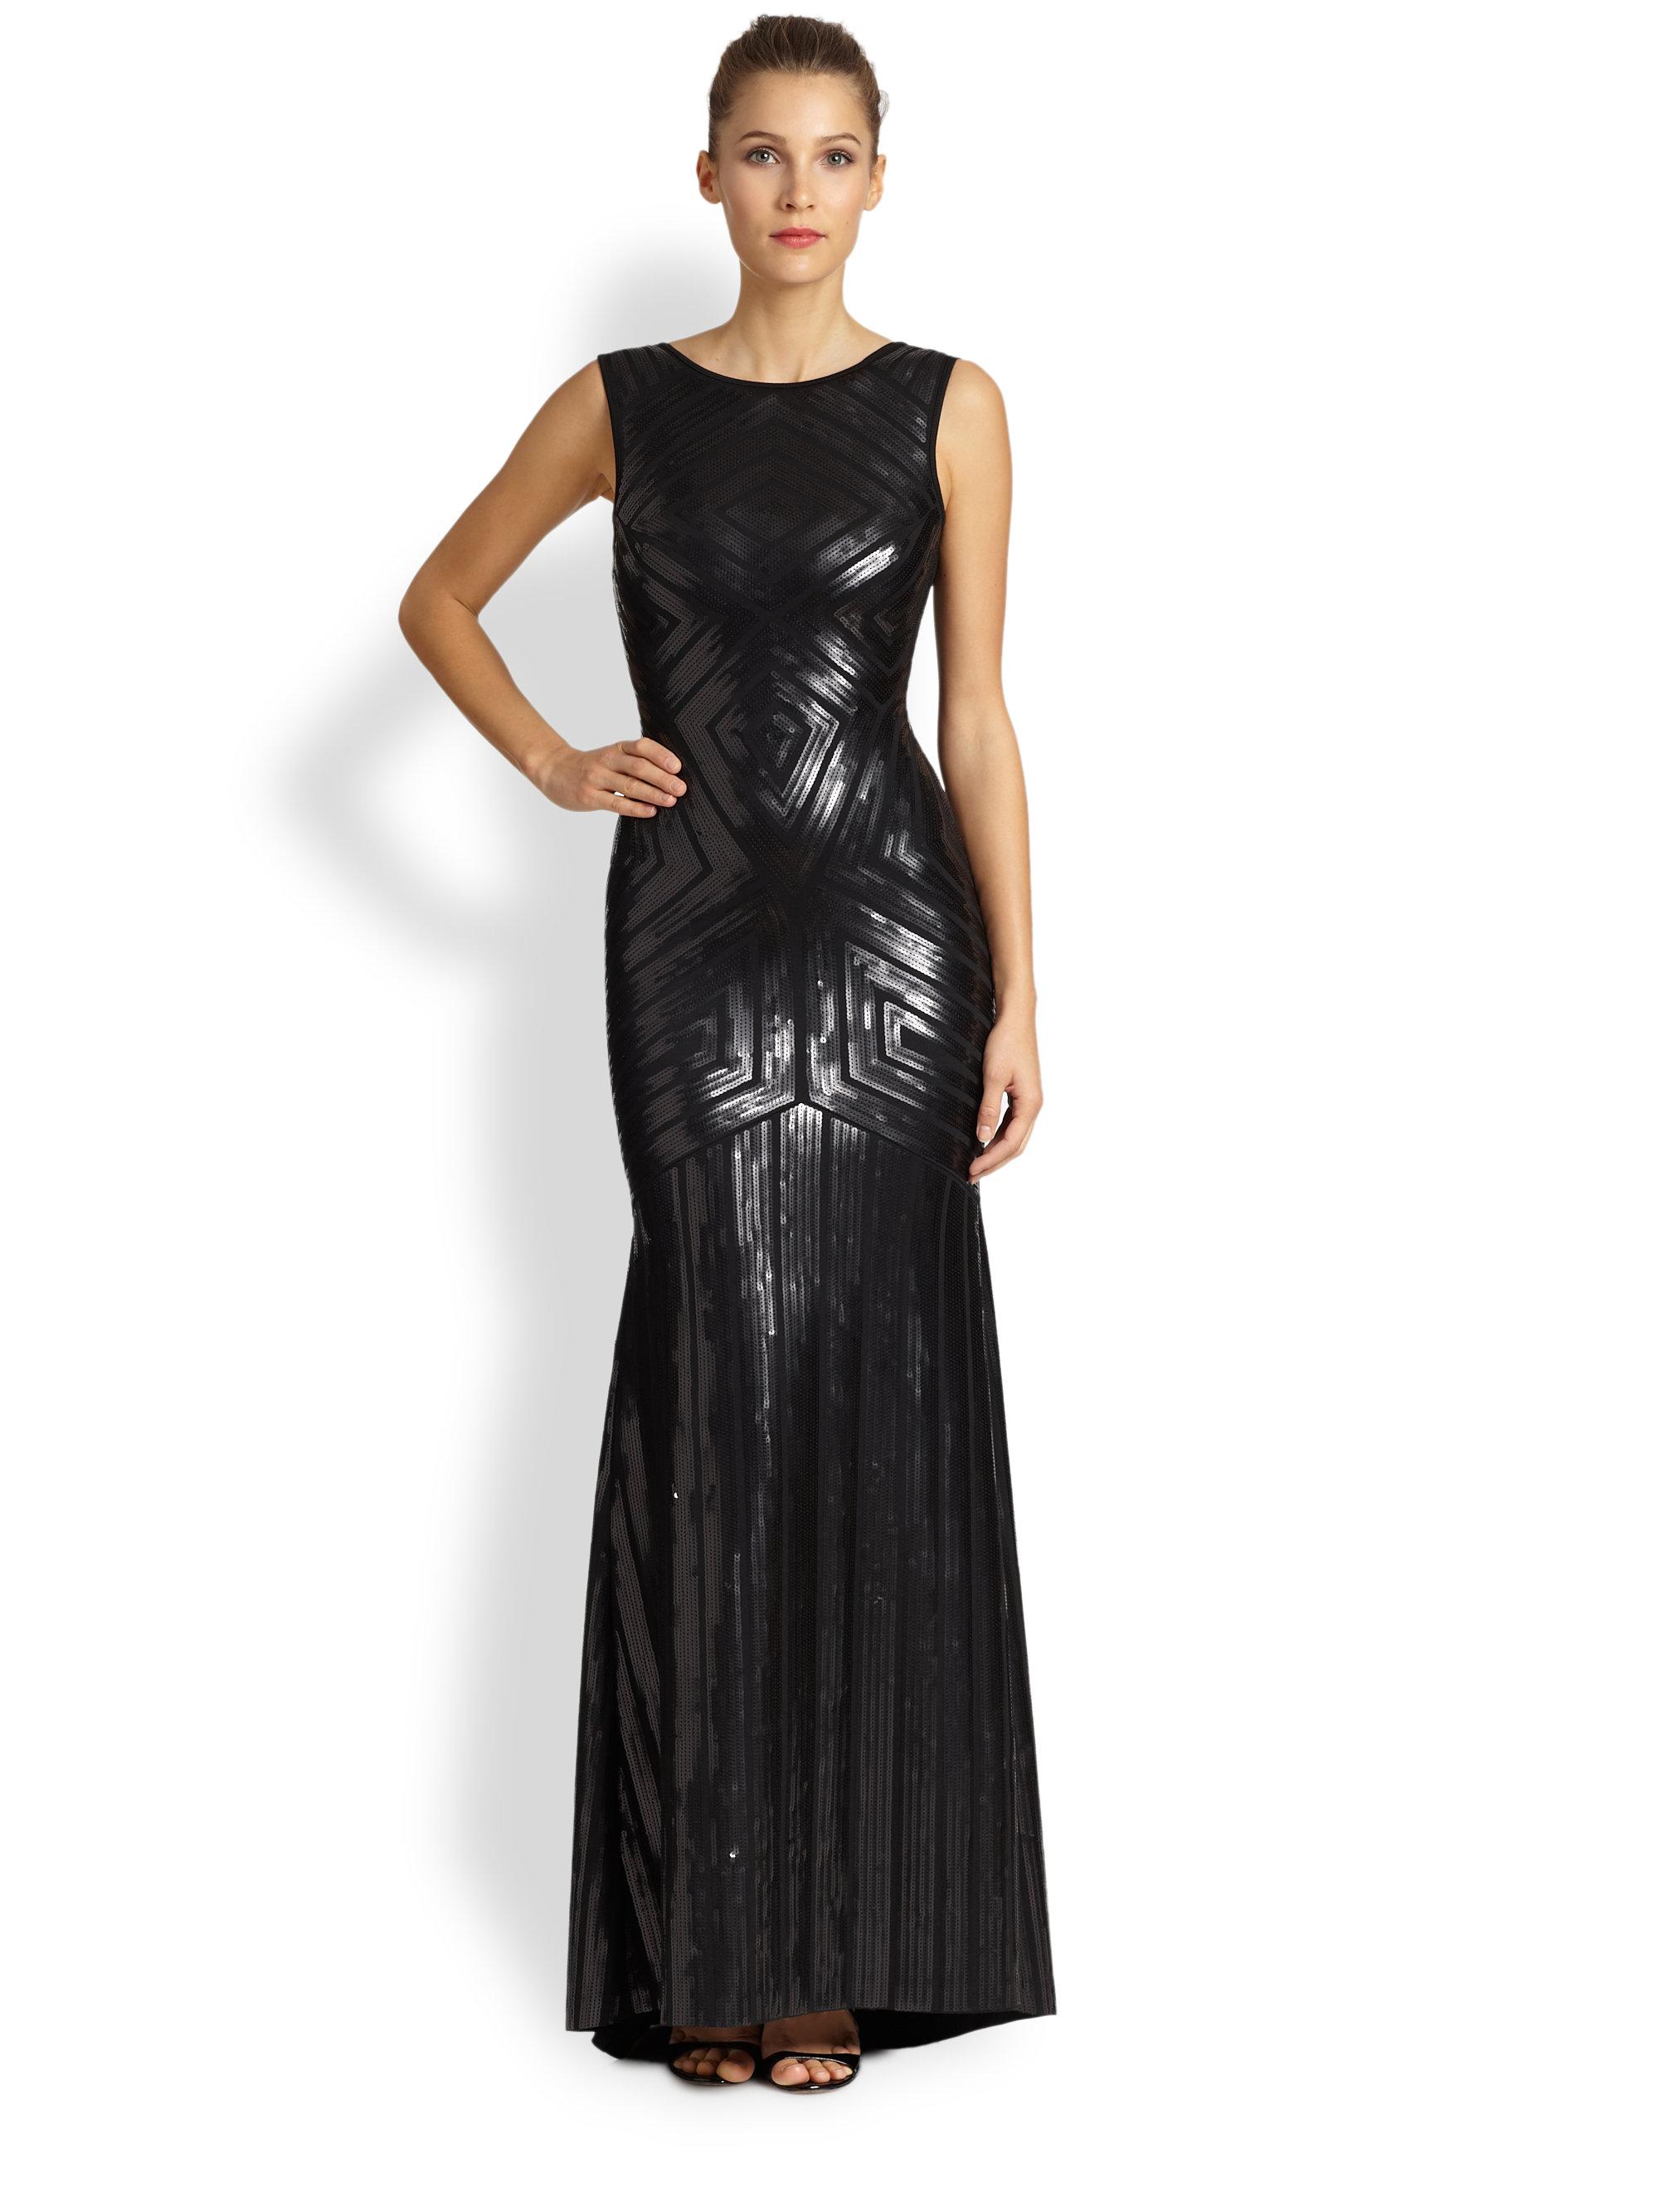 Lyst - Bcbgmaxazria Agne Sequin Gown in Black